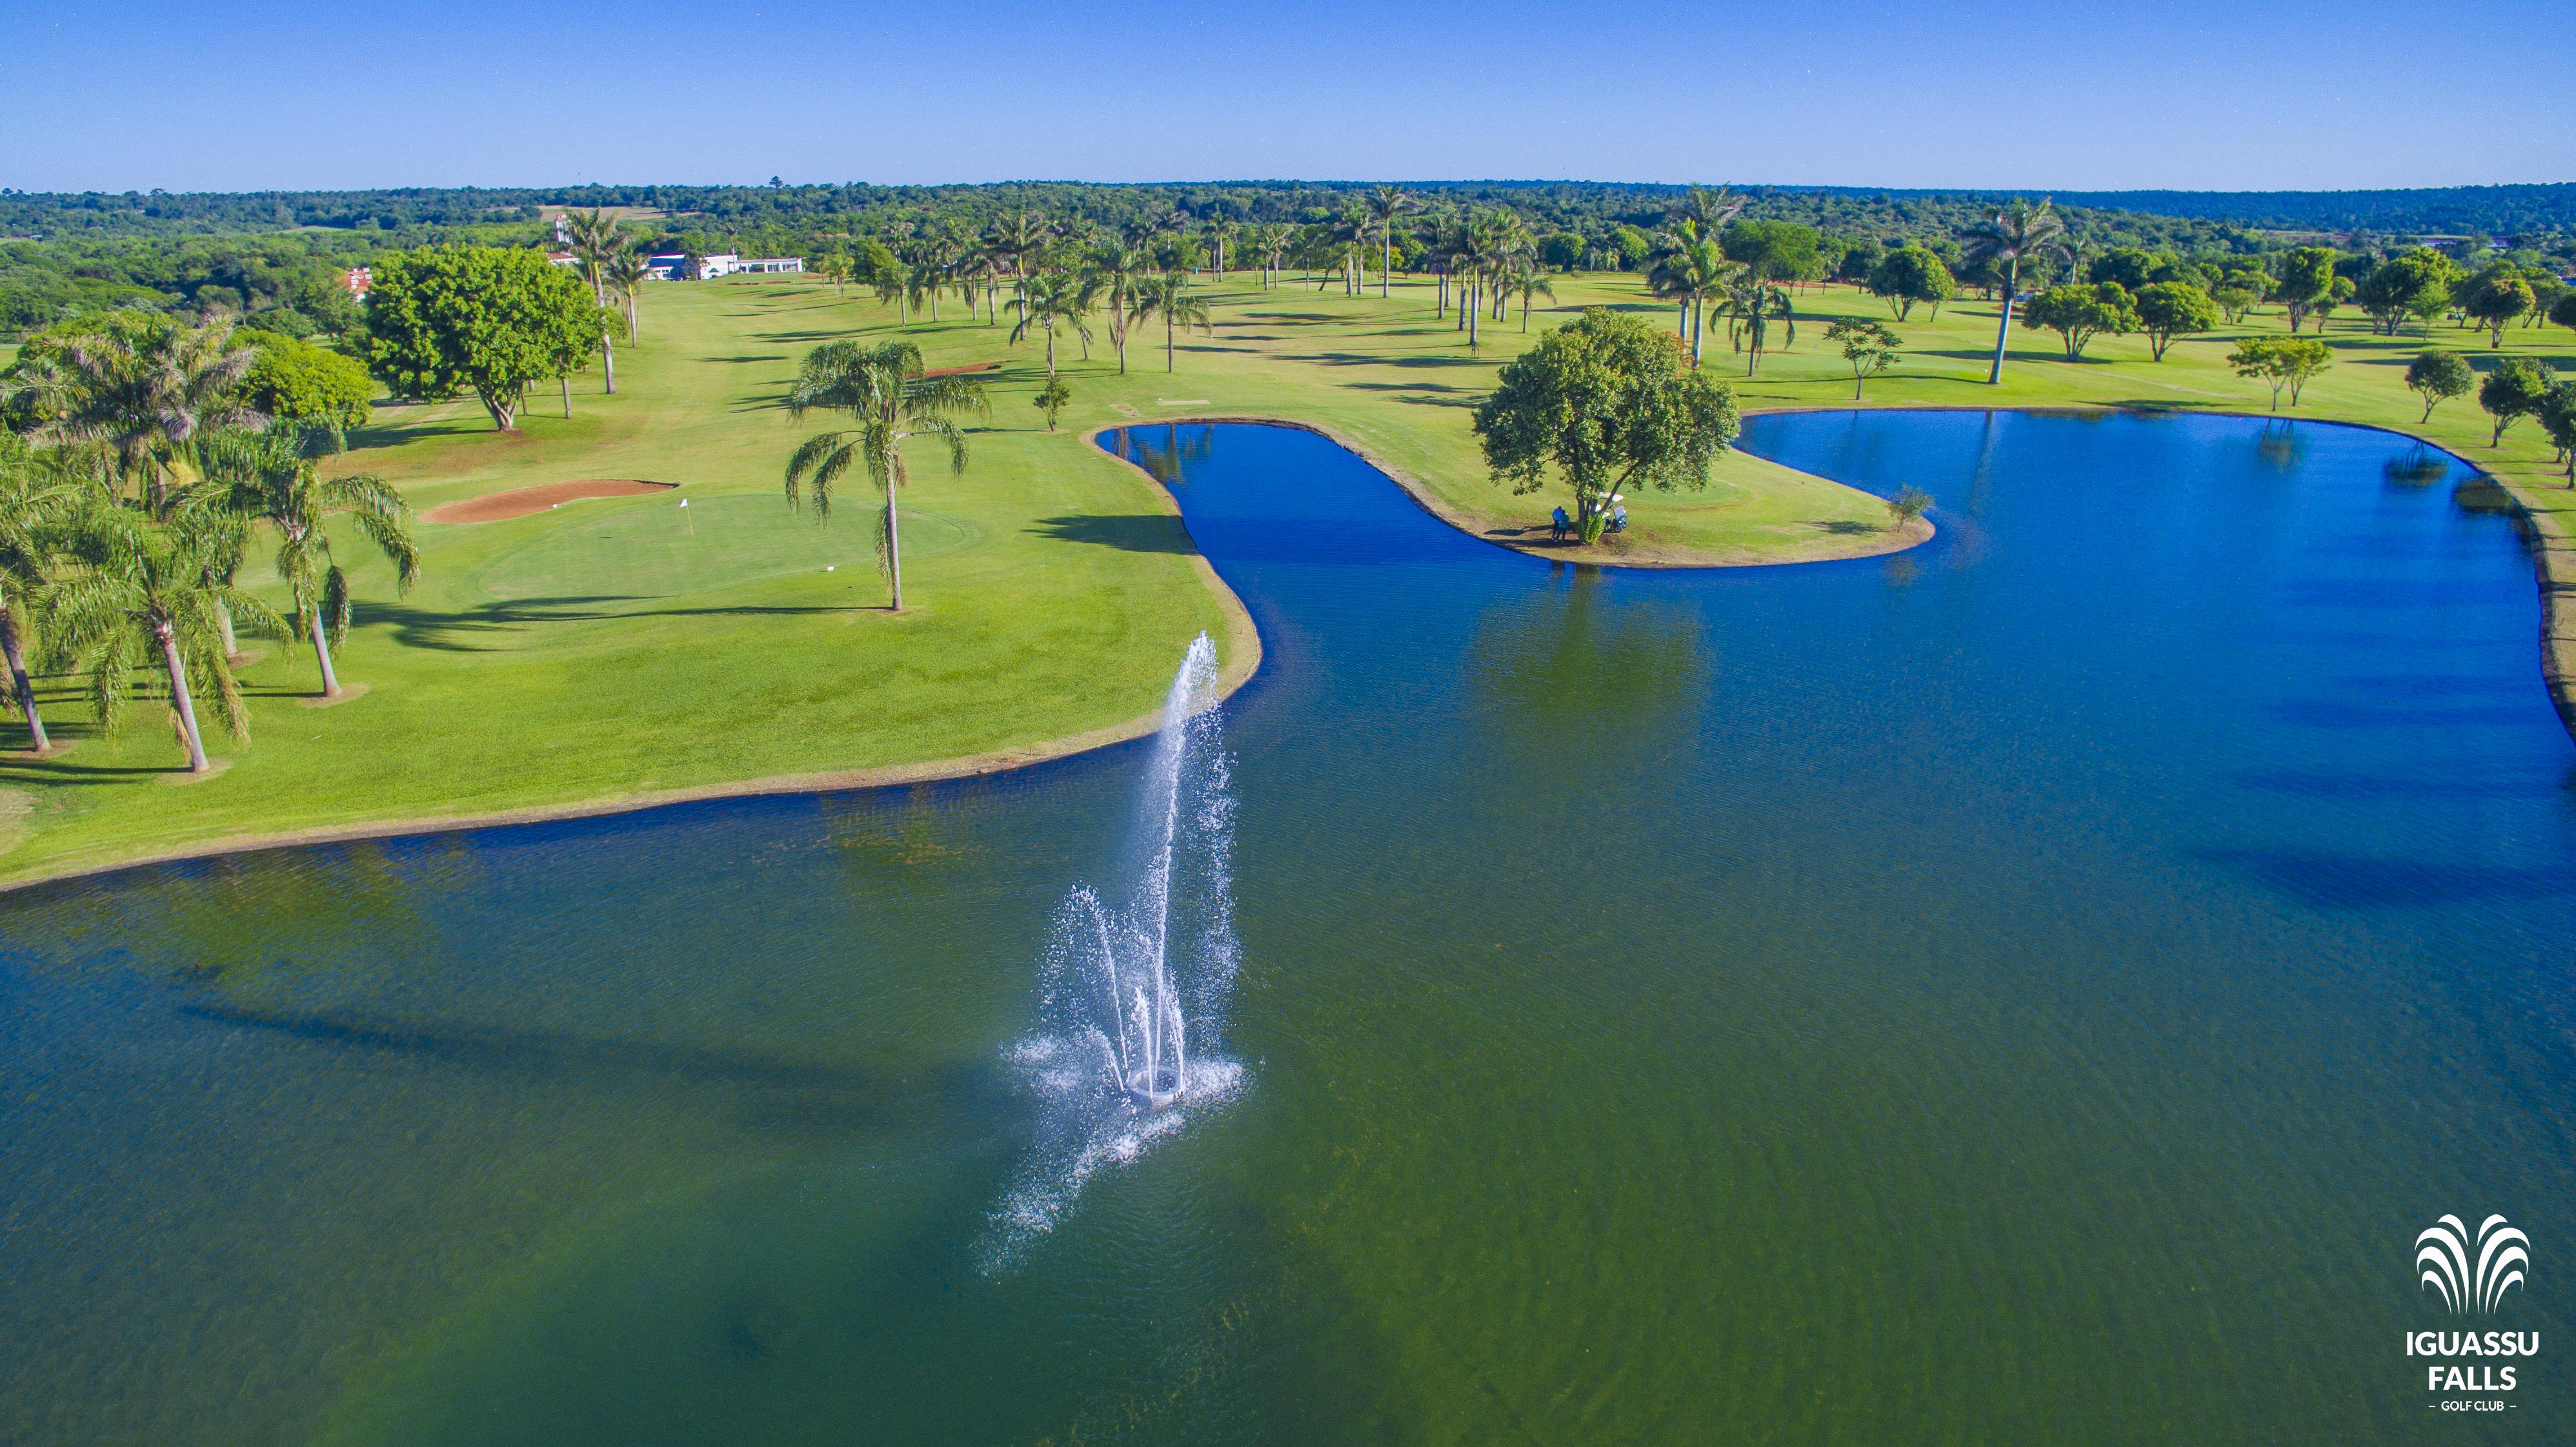 Copa Minero Mix, IV Etapa do Iguassu Golf Tour 2019 no Wish Golf Resort